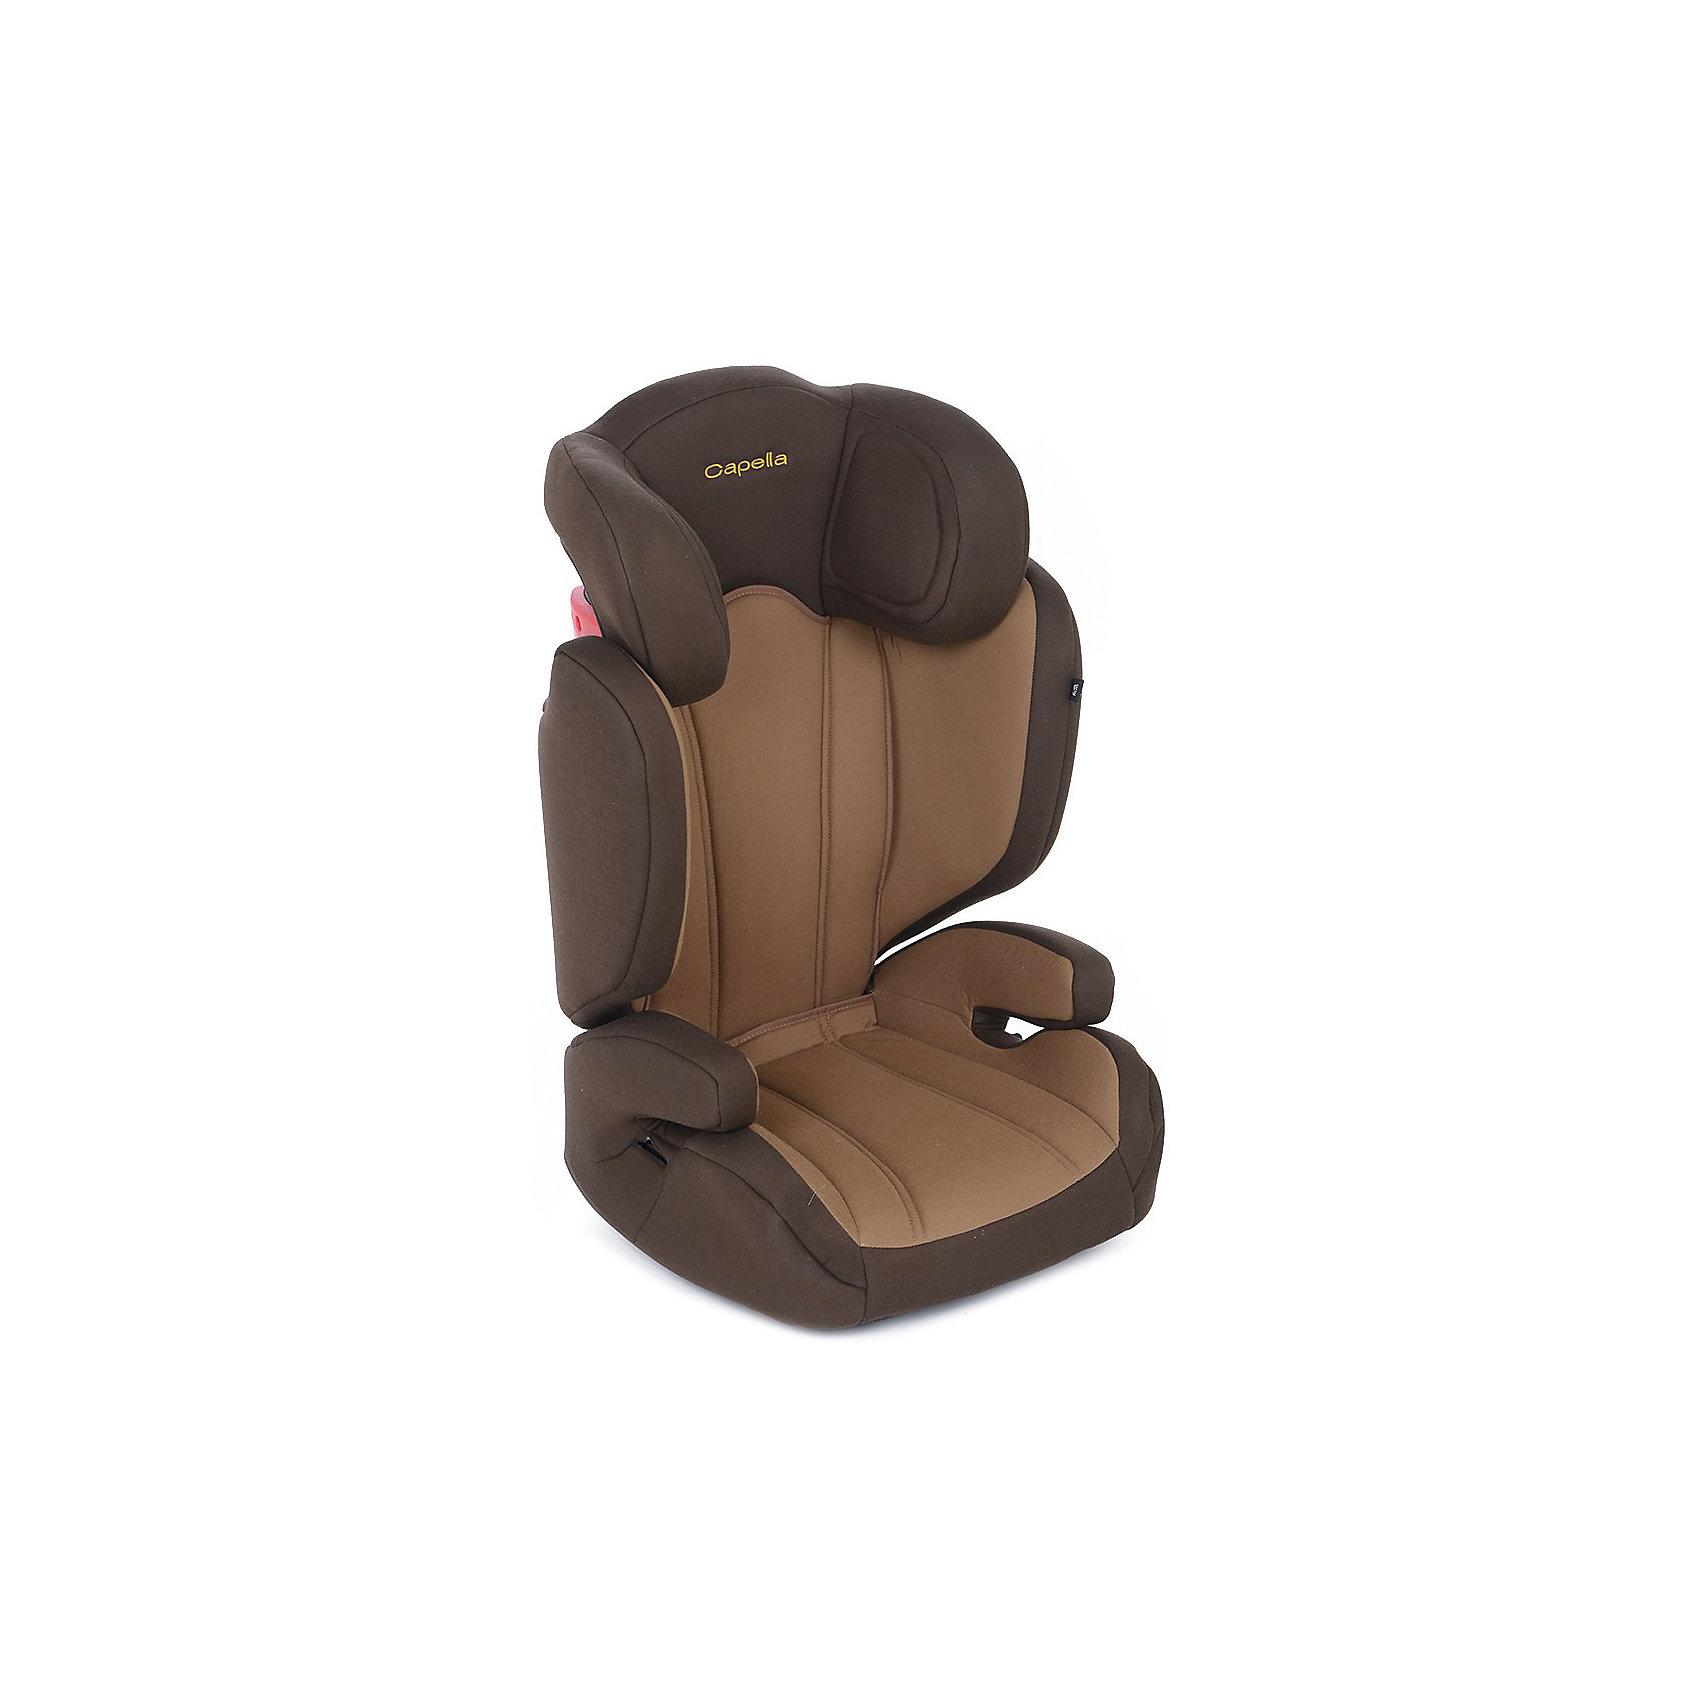 автокресло-15-36-кг-capella-walnut-brown-коричневый-бежевый